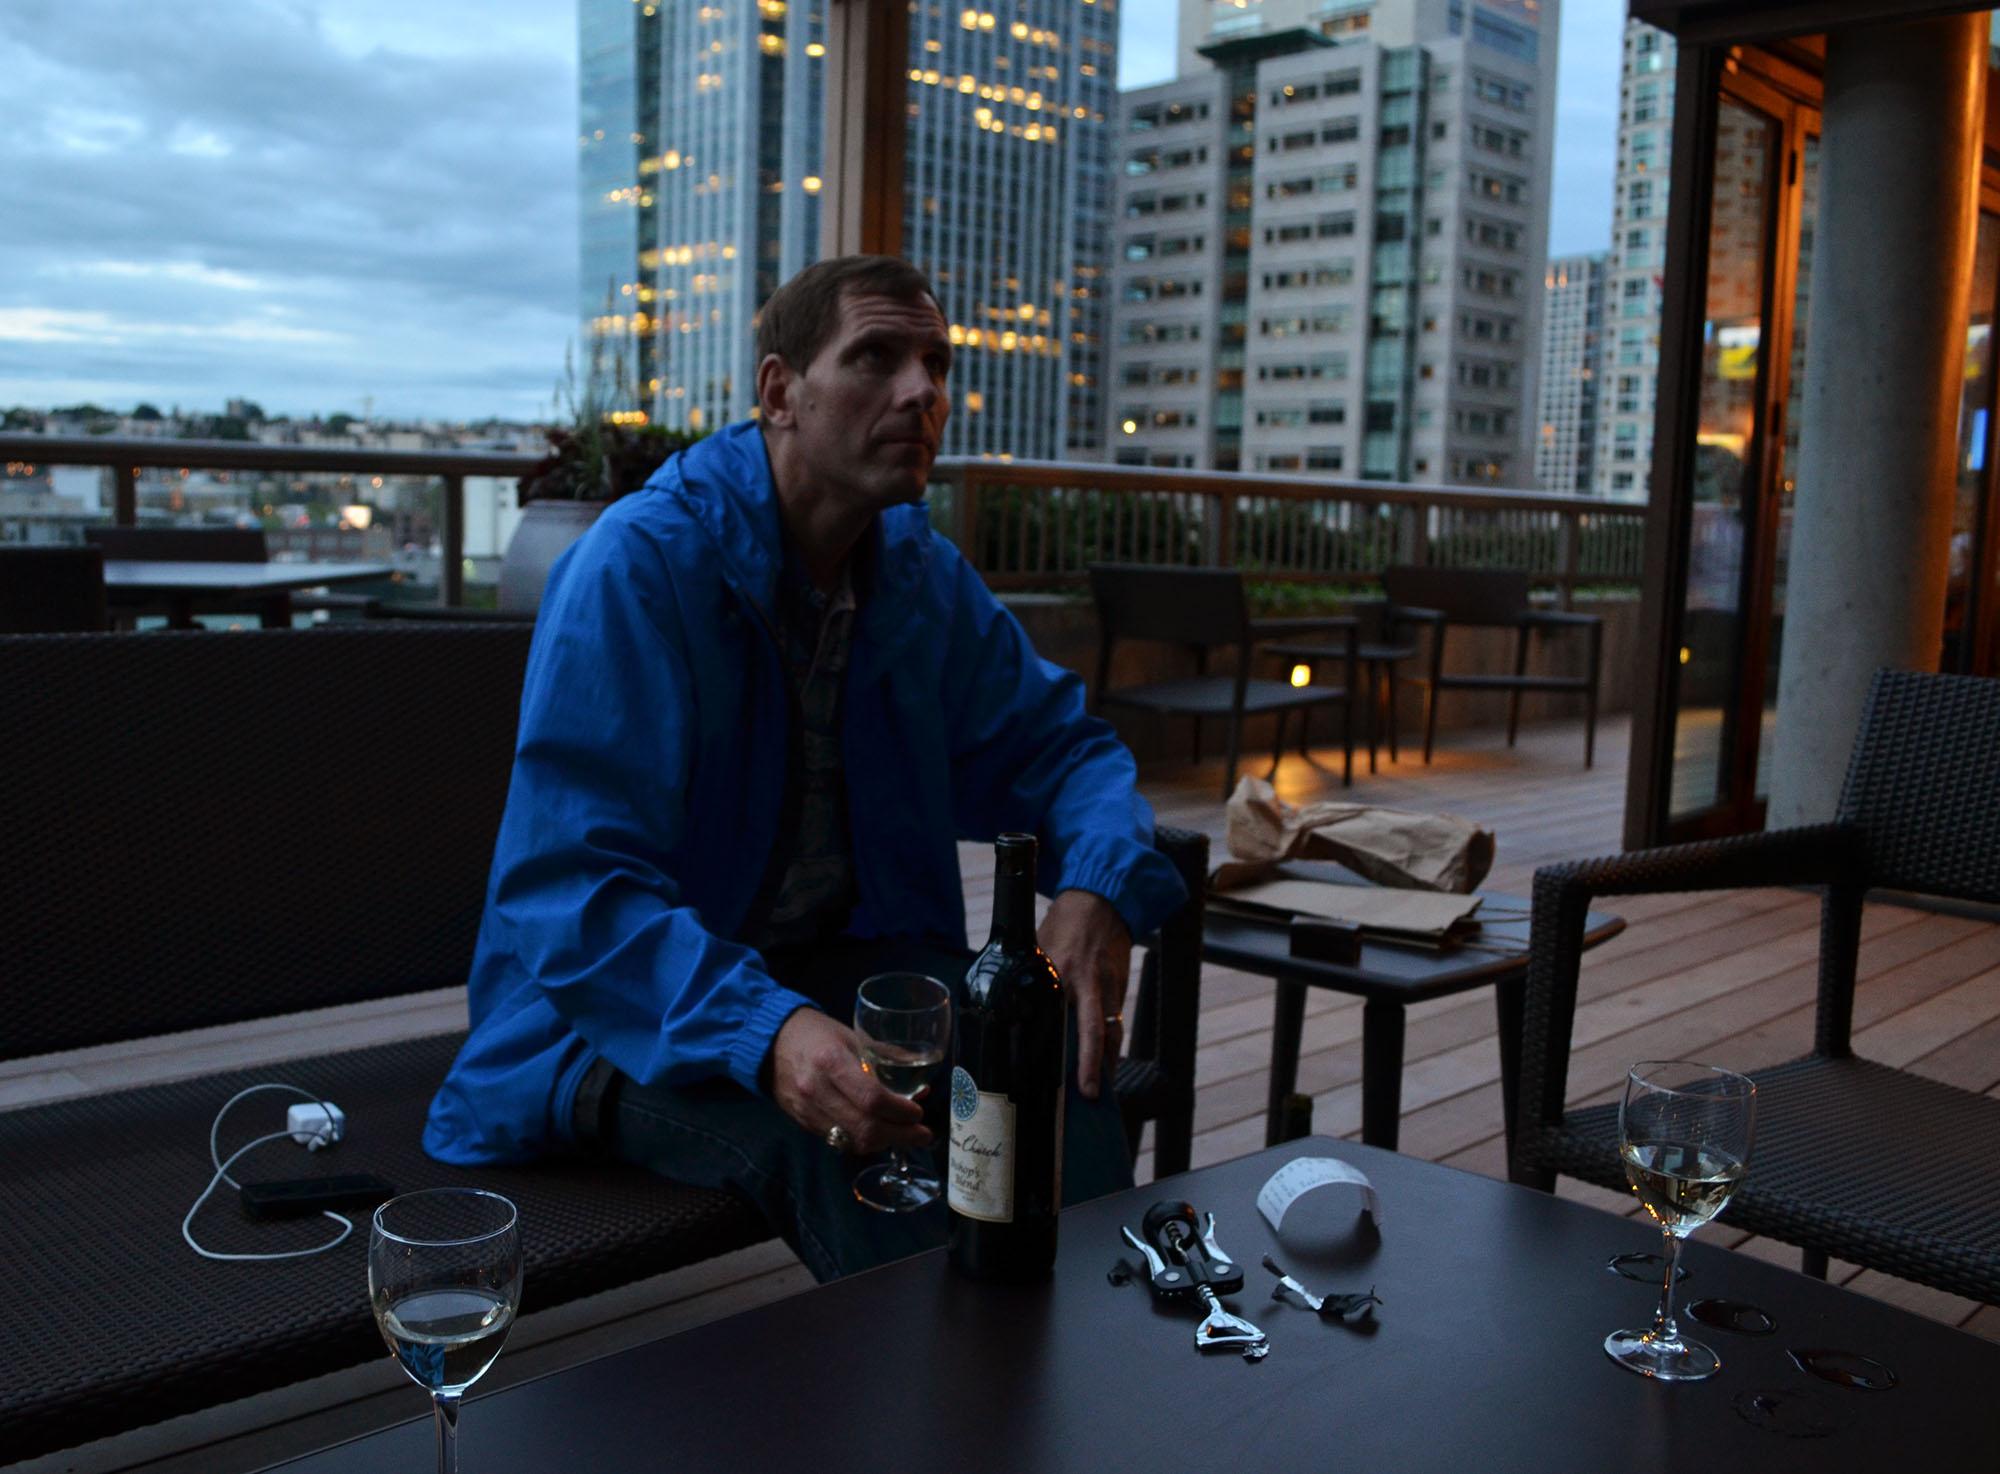 Dad Tasting the Wine